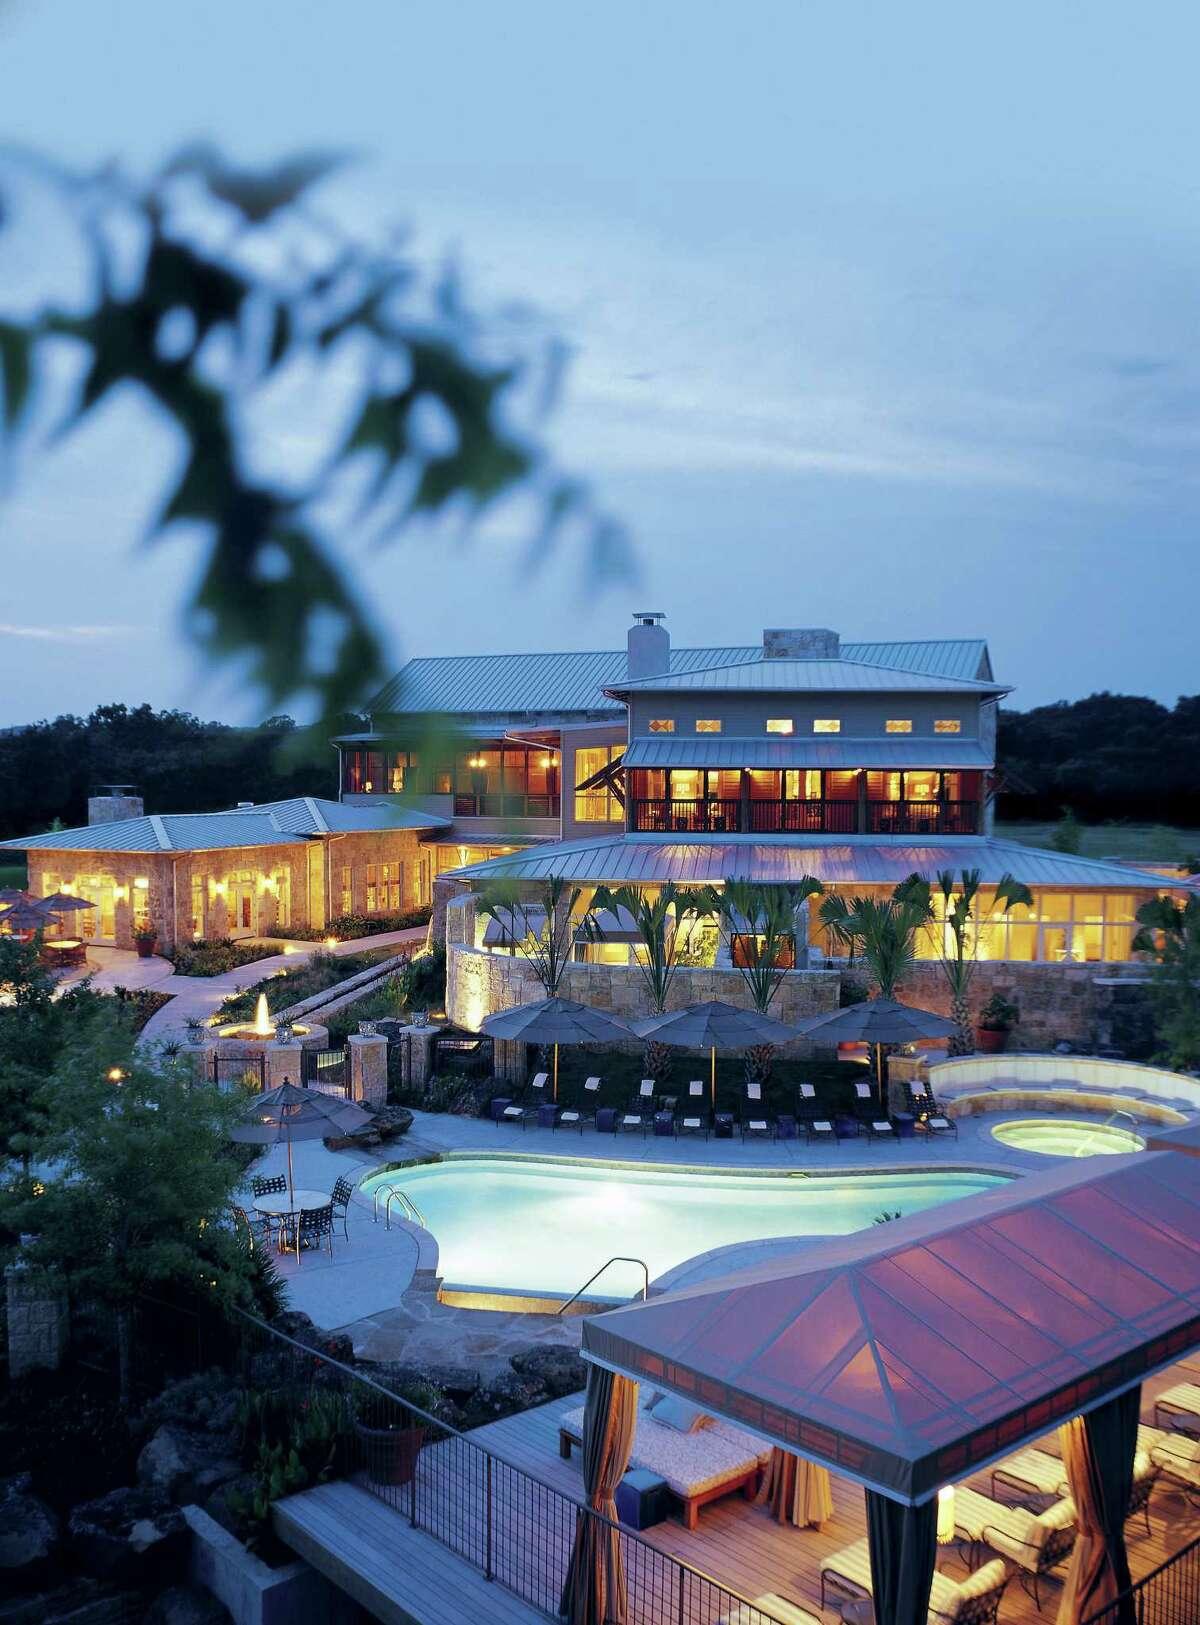 Lake Austin Spa Resort in Austin is set on 19 lake-front acres.